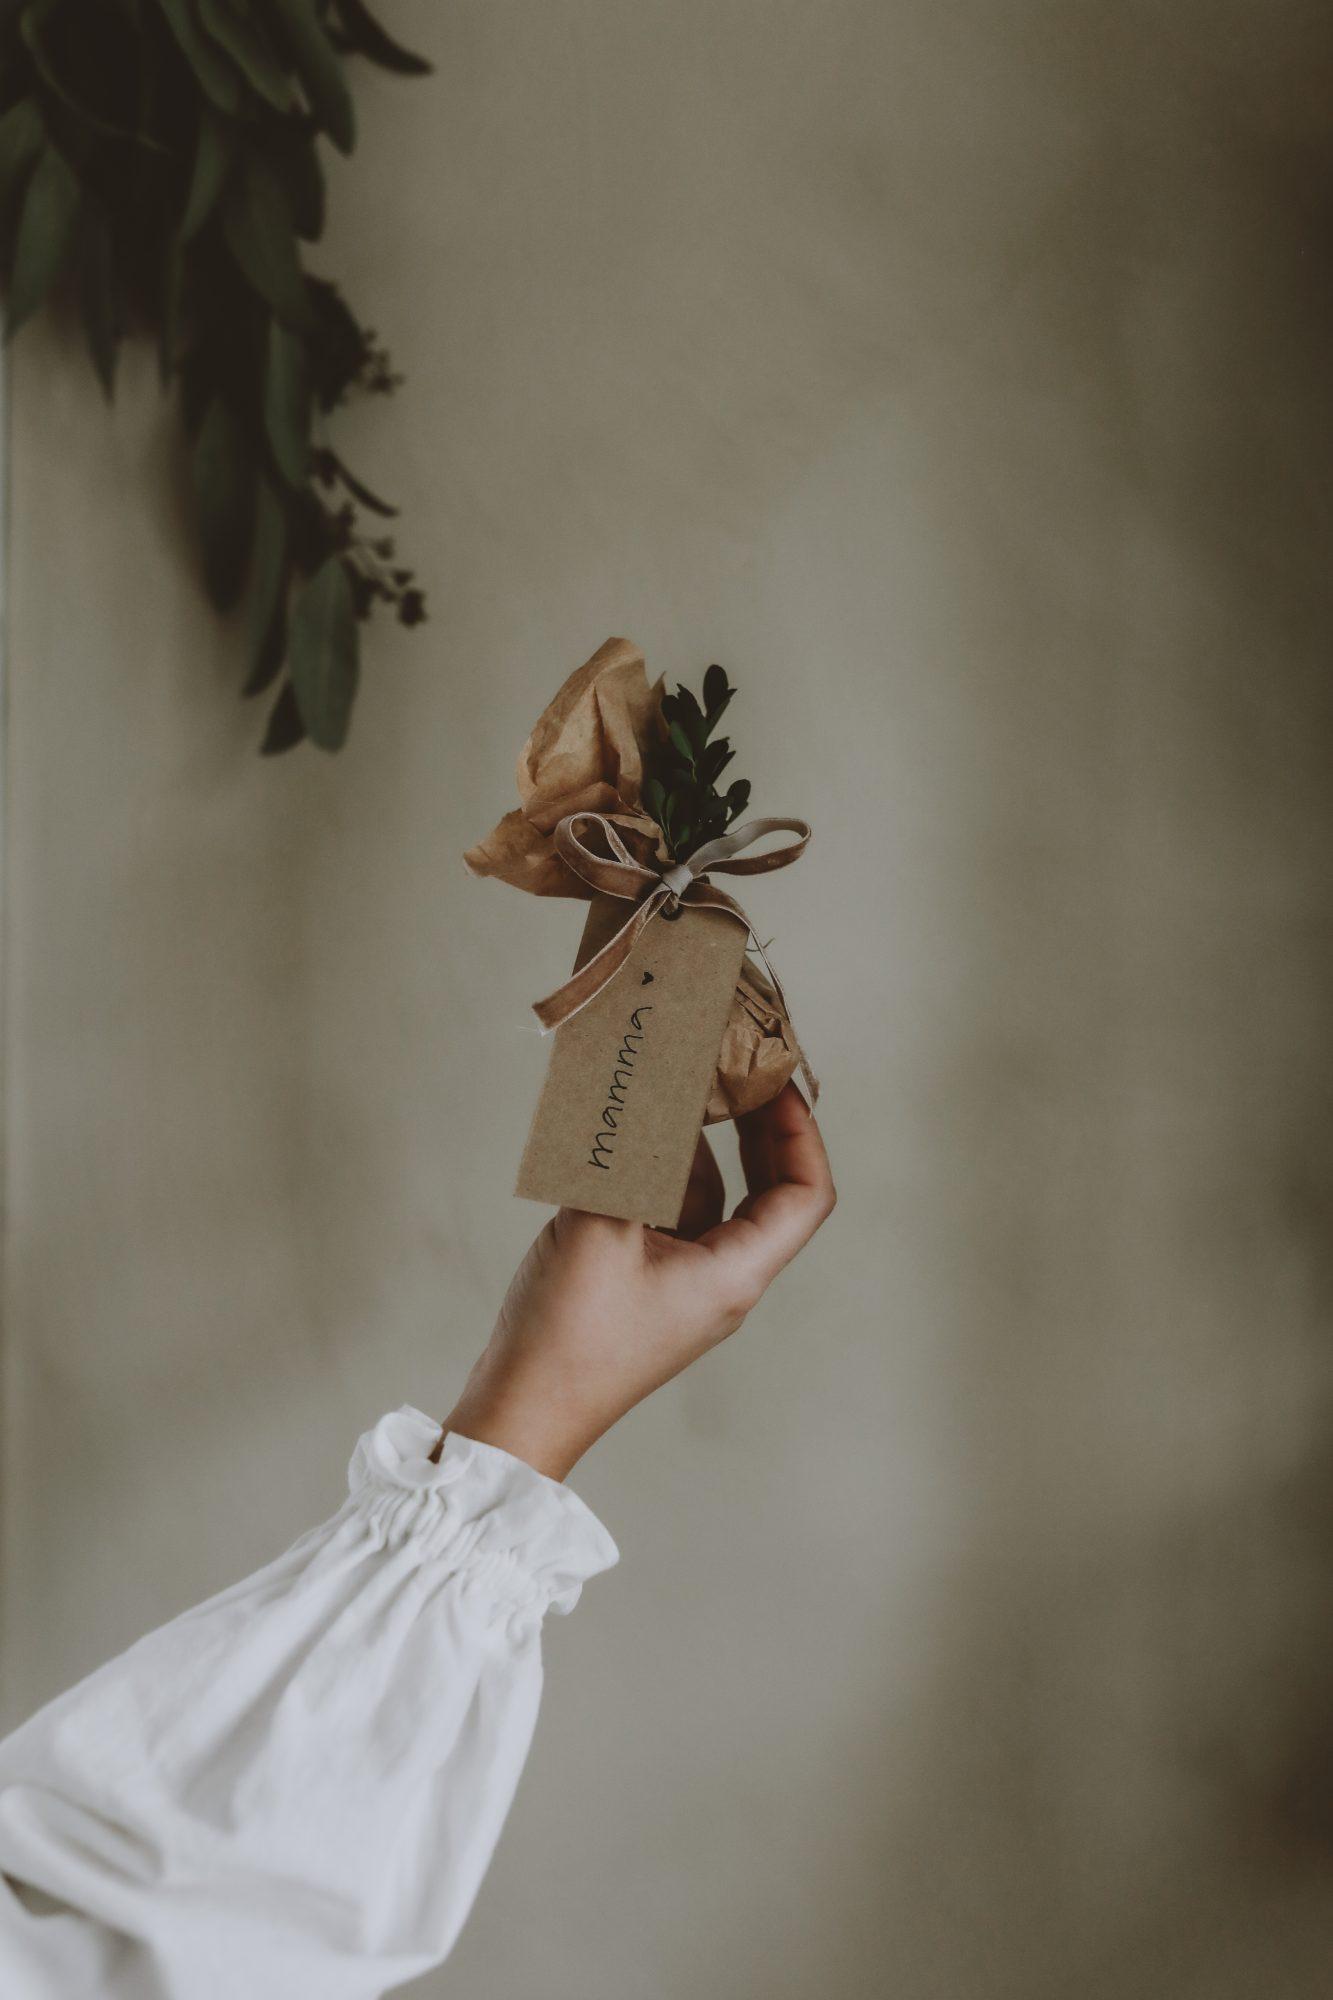 Emily Slotte present